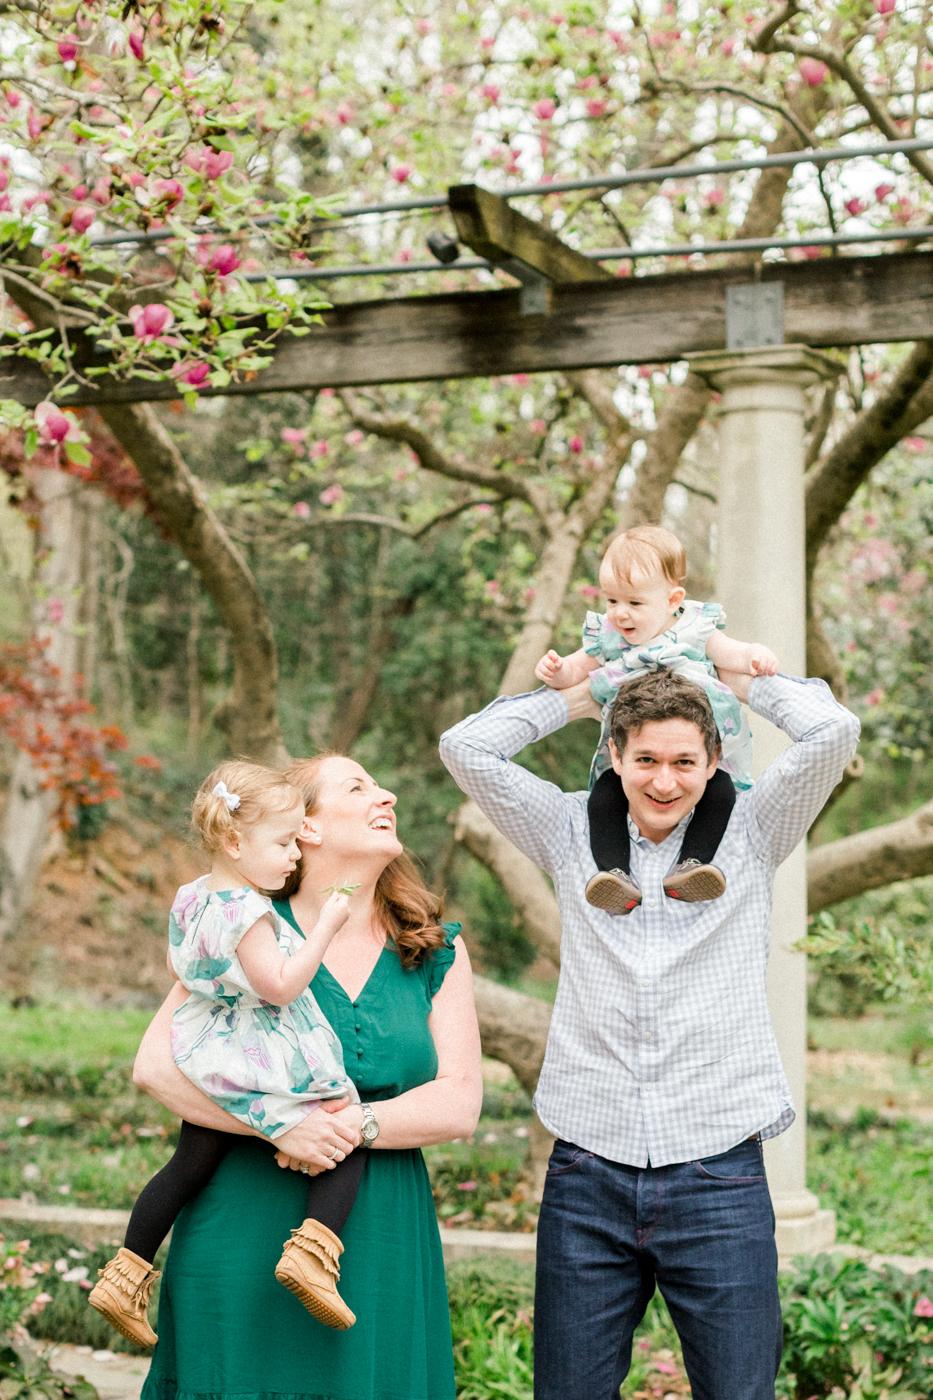 Four Corners Photography atlanta family photographer decatur newborn photographer atlanta spring mini sessions decatur fall mini sessions family photography best atlanta newborn photographer-12.jpg